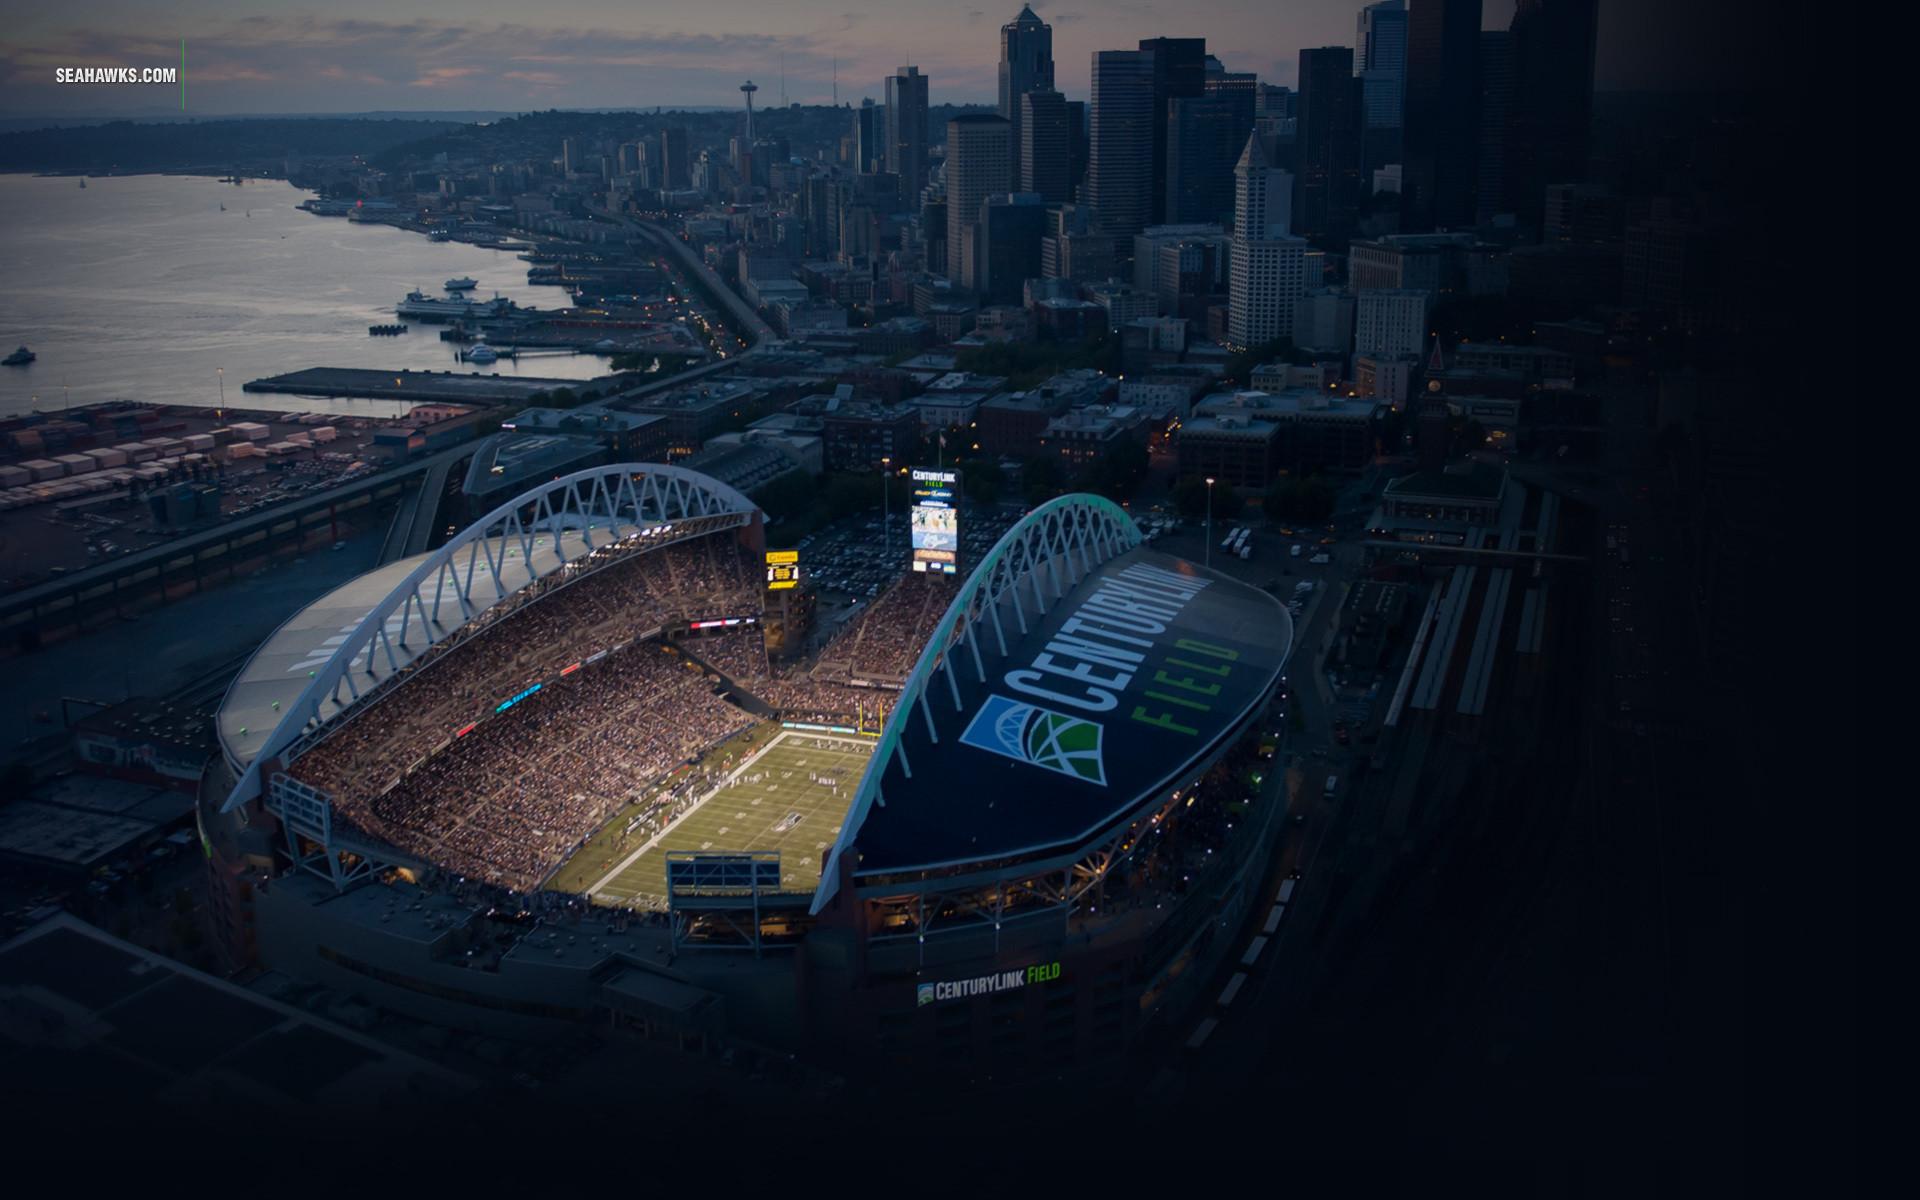 Wallpaper Nature With Quotes Seattle Seahawk Stadium Backgrounds Pixelstalk Net